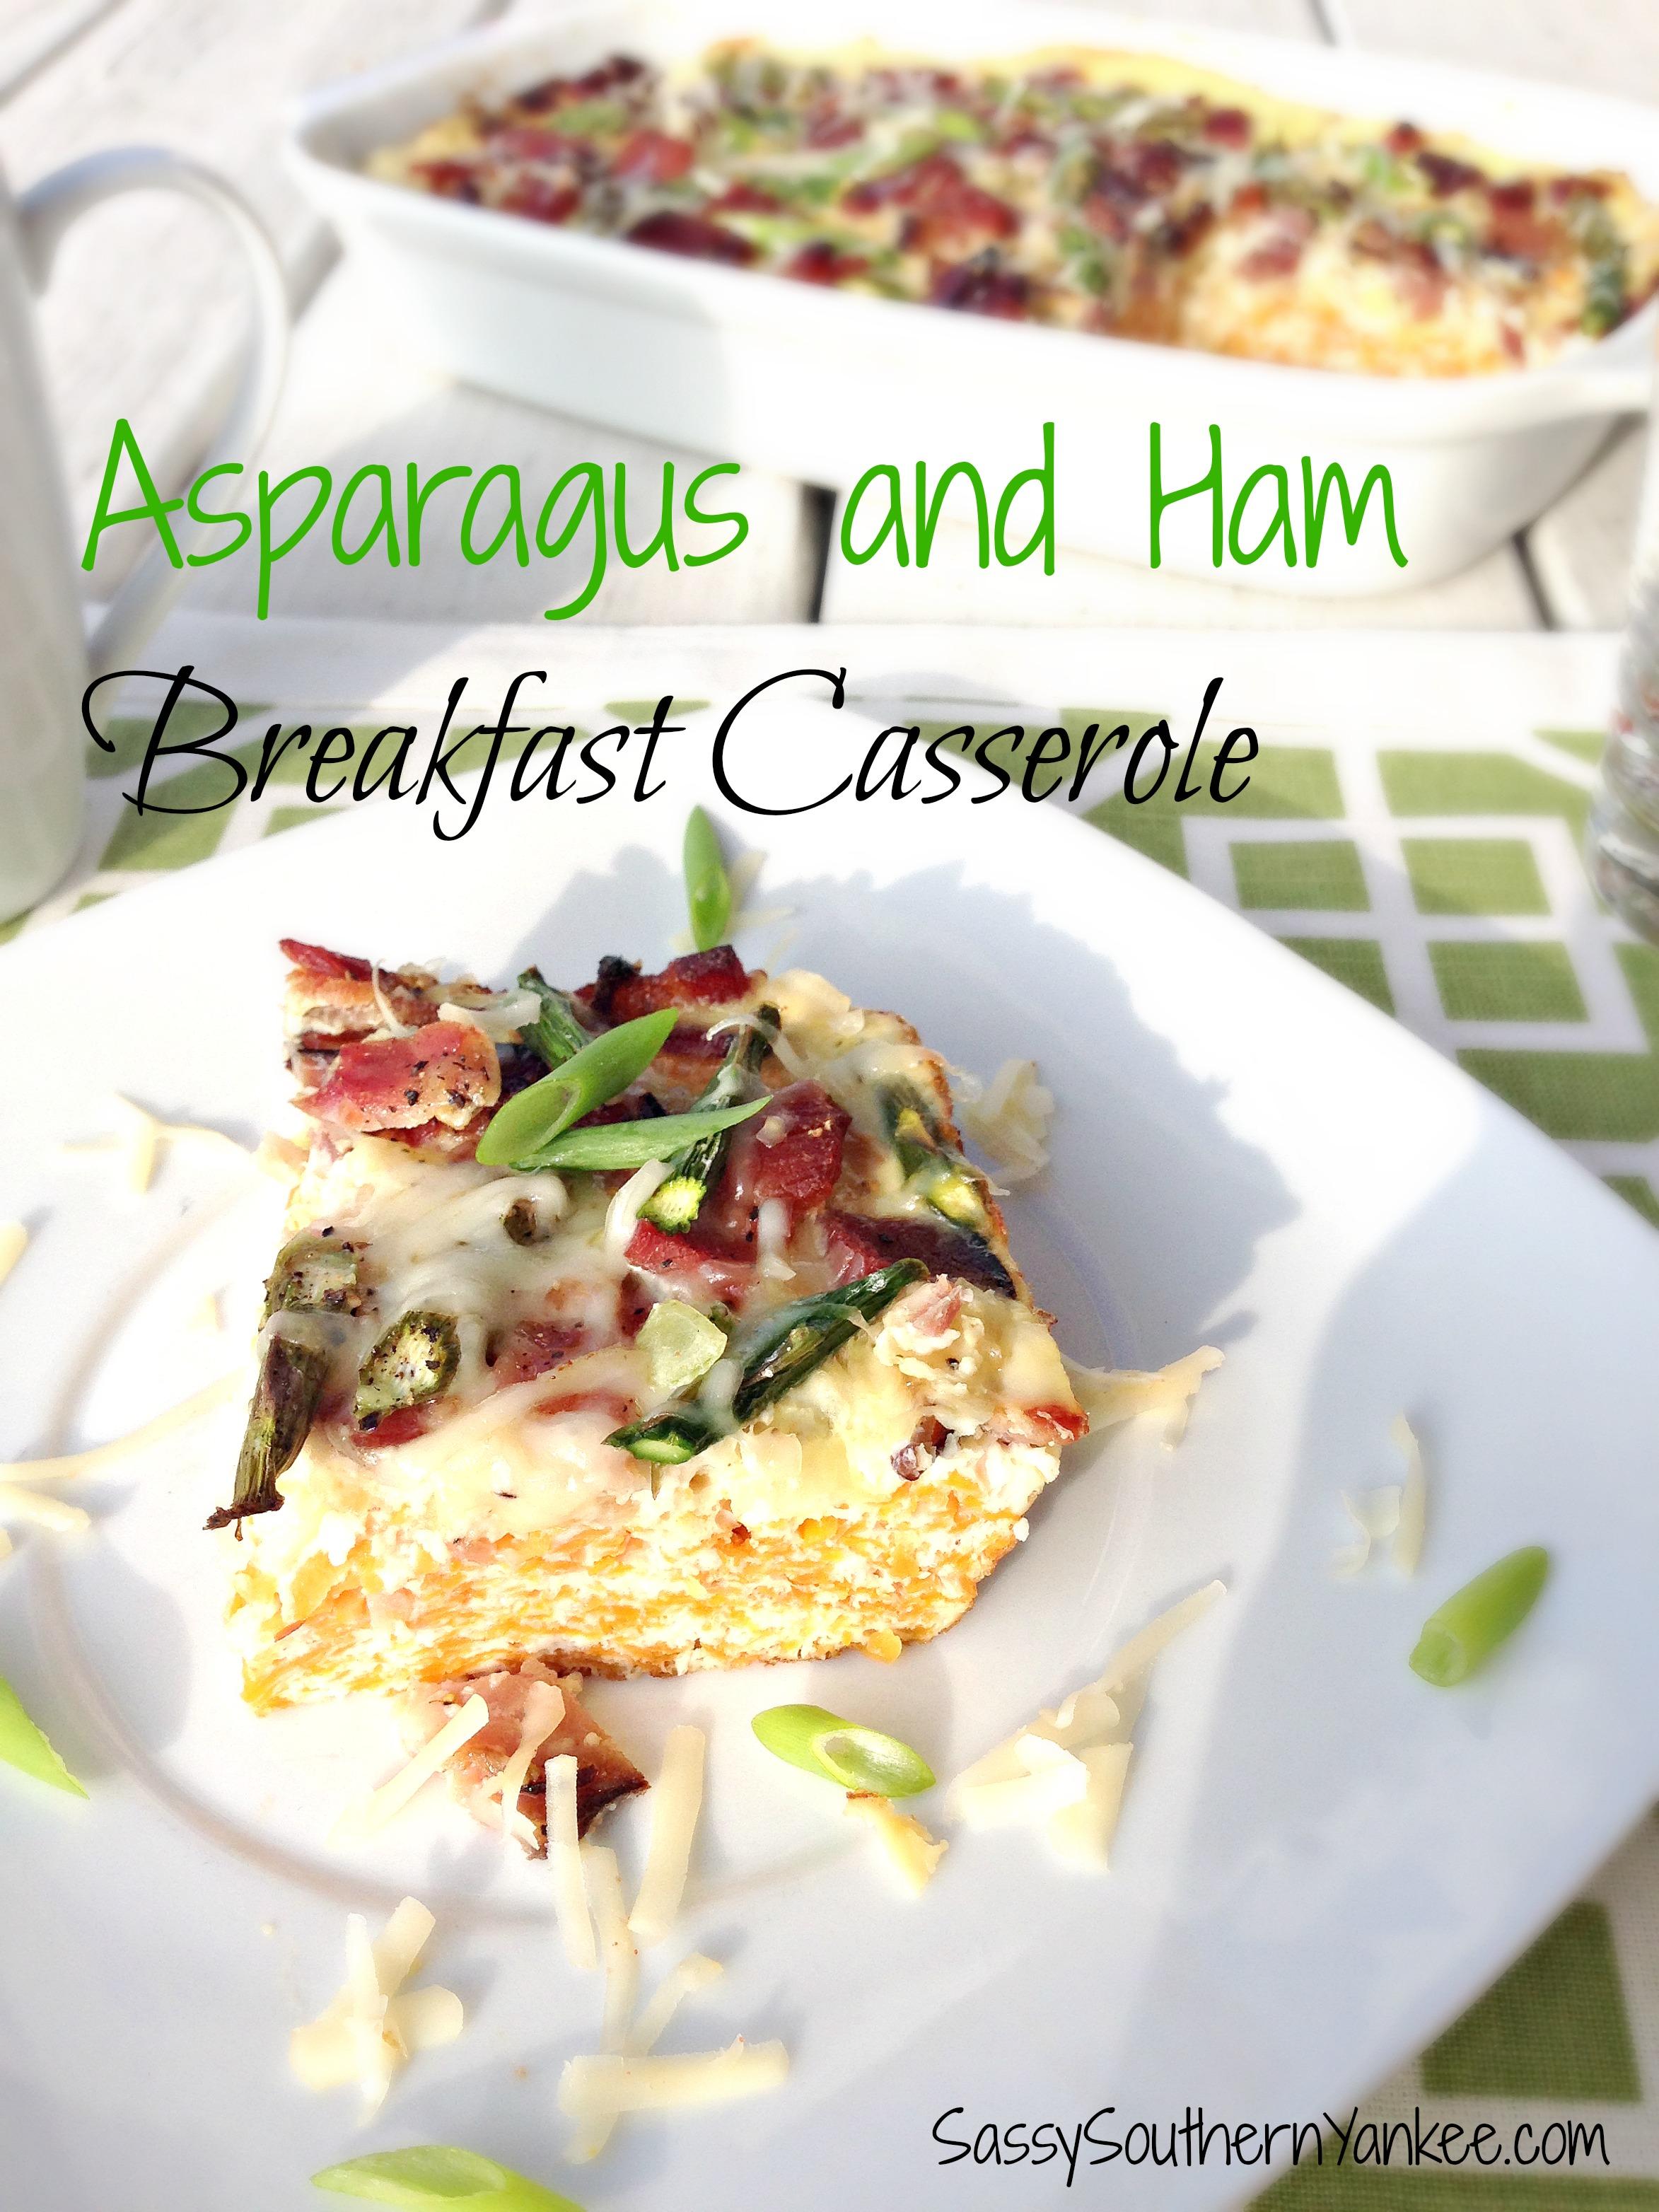 I Hope You Enjoy This Easy Asparagus And Ham Breakfast Casserole! Asparagus  And Ham Breakfast How To Perfectly Roast Fresh Asparagus